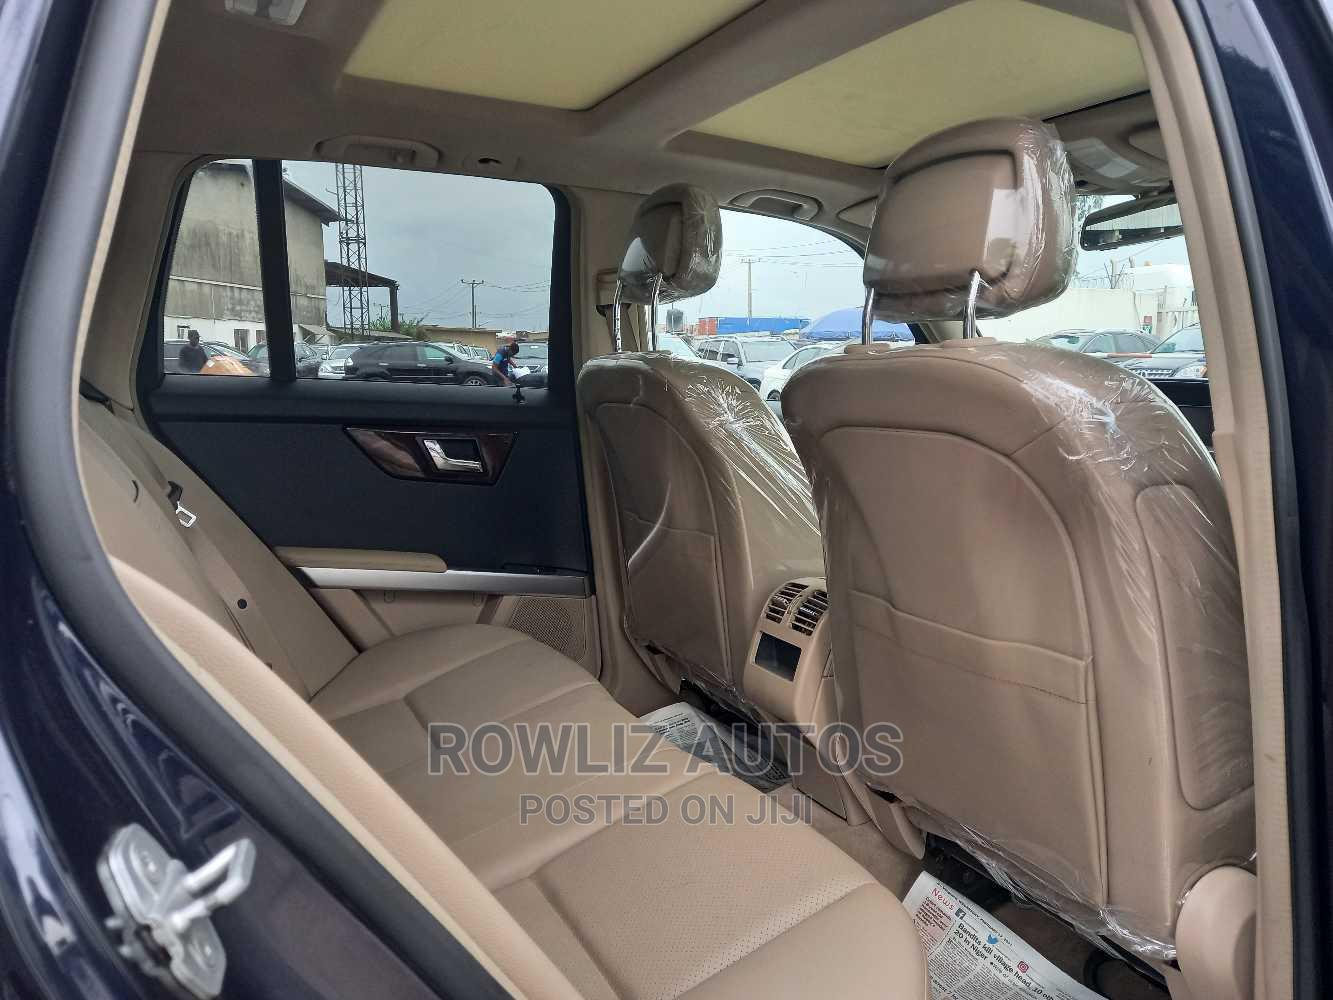 Mercedes-Benz GLK-Class 2012 350 4MATIC Blue   Cars for sale in Apapa, Lagos State, Nigeria